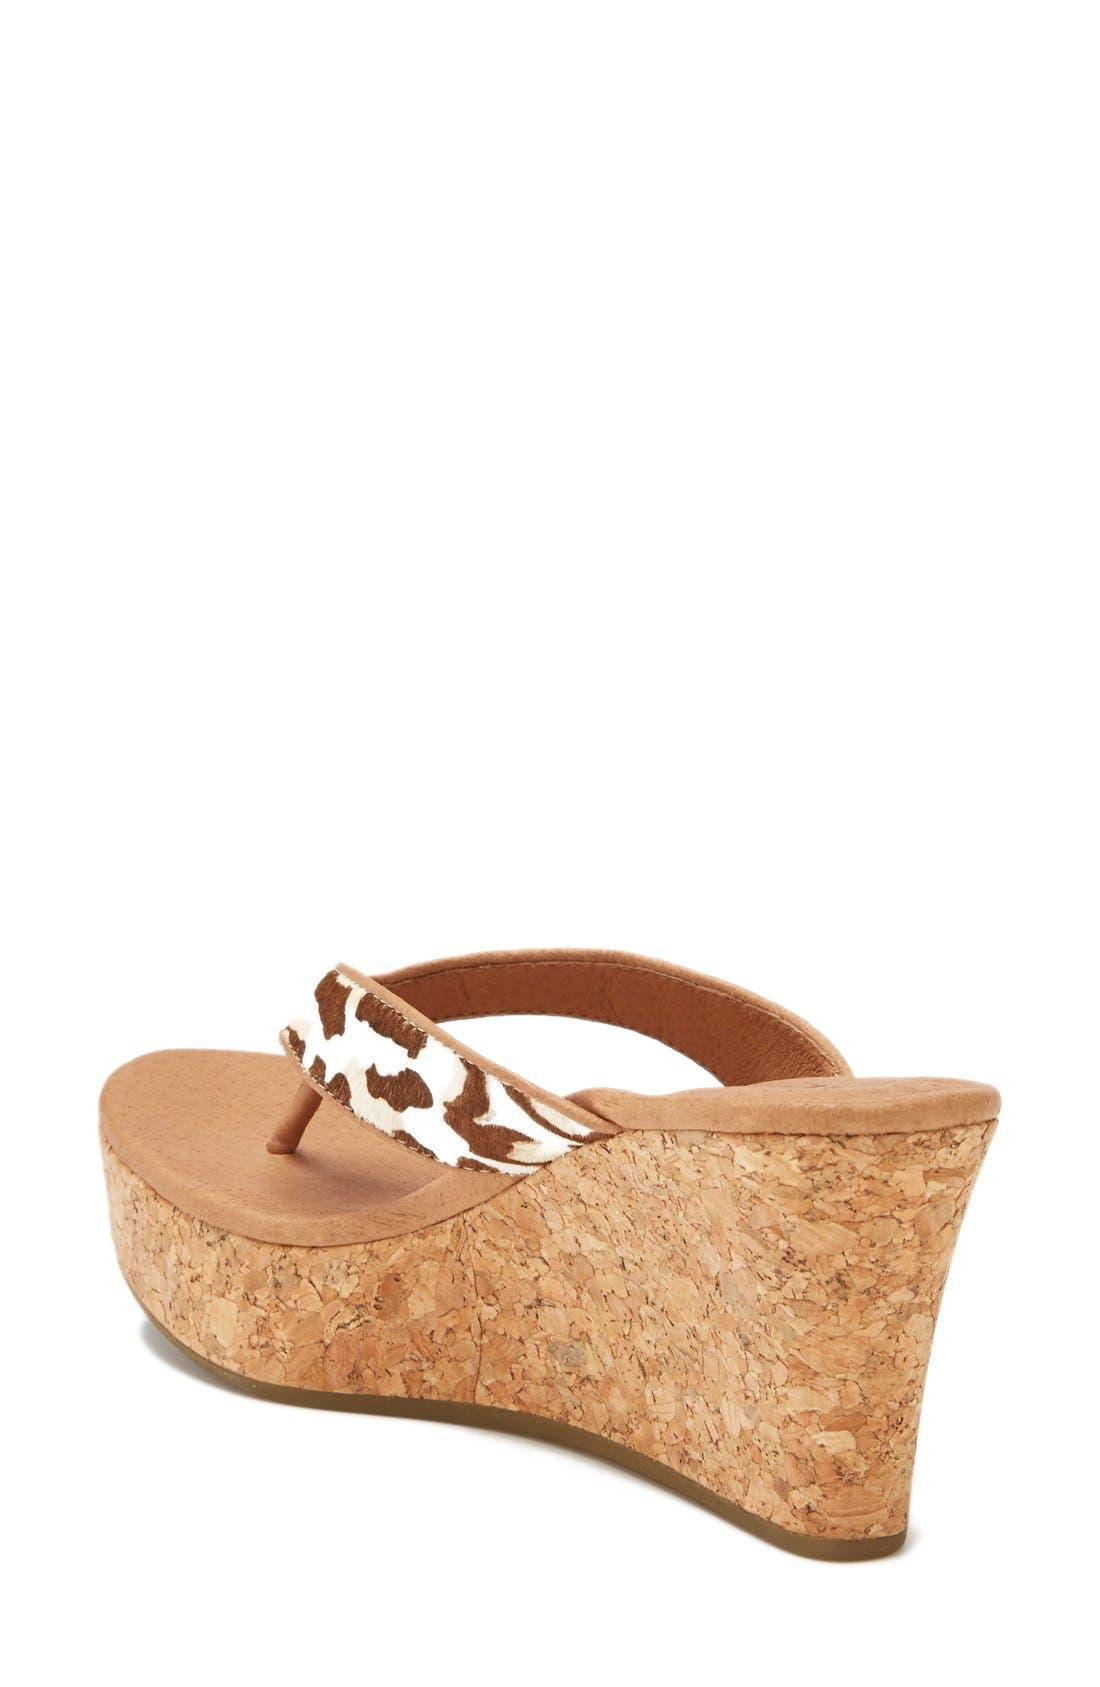 Alternate Image 2  - UGG Australia 'Natassia' Calf Hair Wedge Sandal (Women)